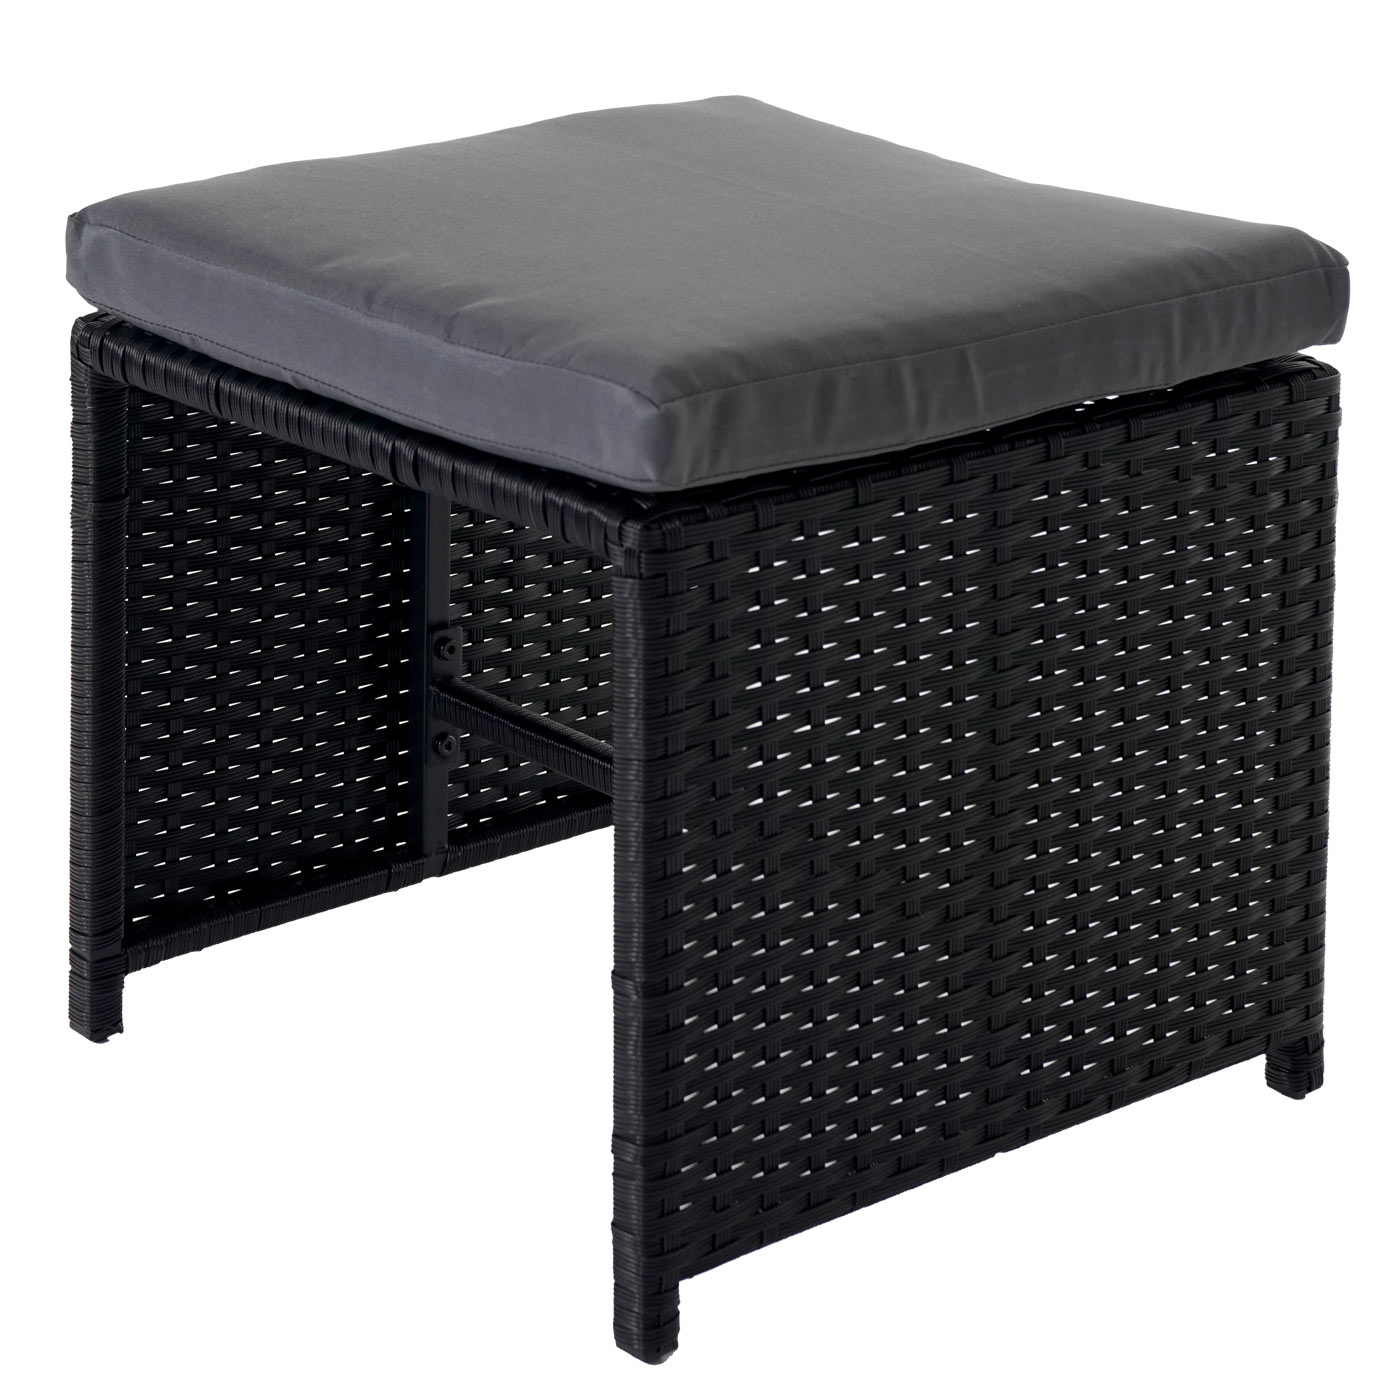 Rattan lounge schwarz grau  Poly-Rattan Garten-Garnitur Kreta, Lounge-Set Sitzgruppe ~ 4 Stühle ...